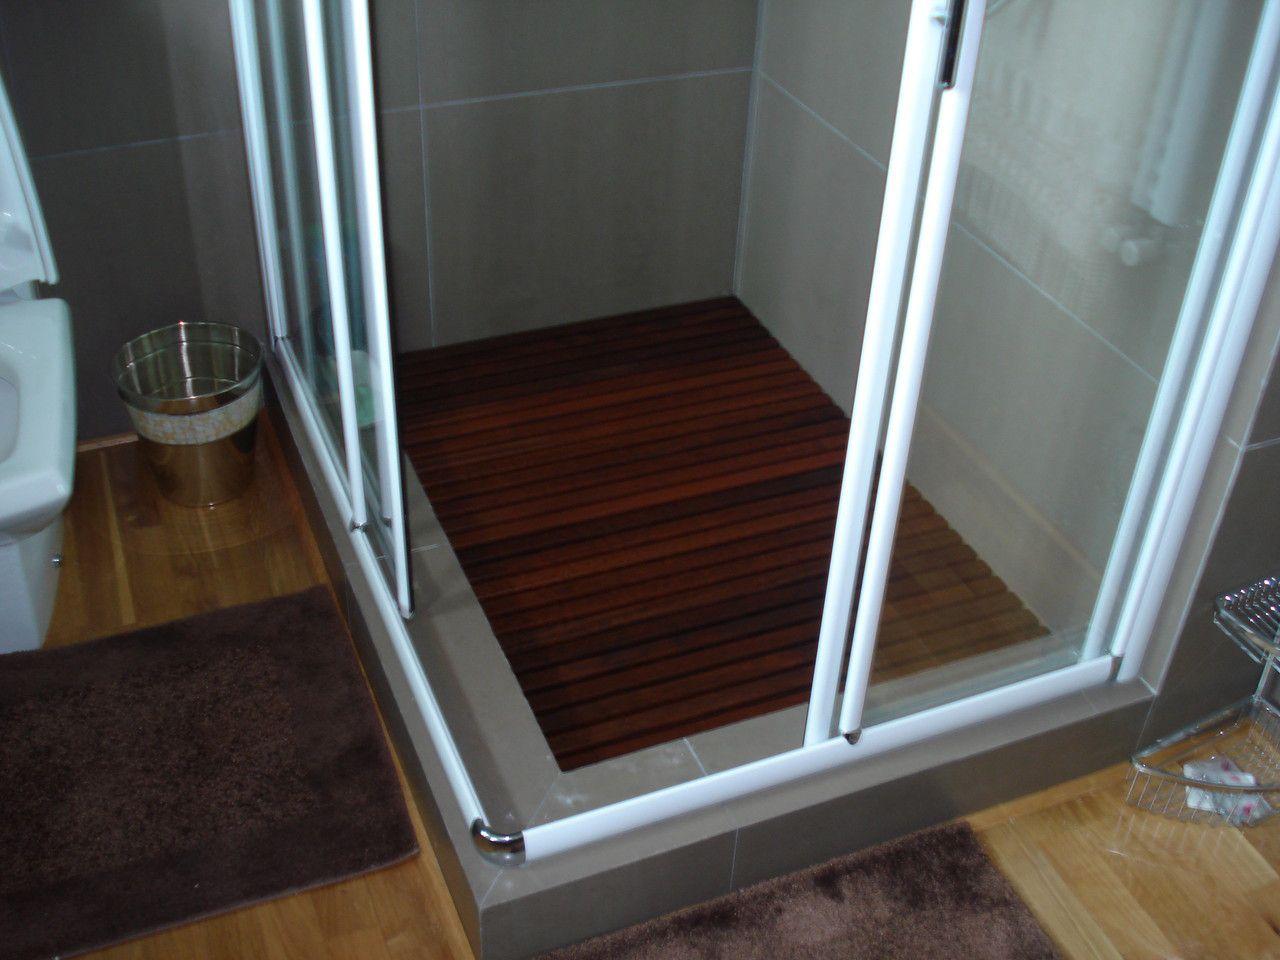 Deck De Madeira Chuveiro Box Banheiro Capacho 120x72 cm Sem Pintura Acabamento Lixado